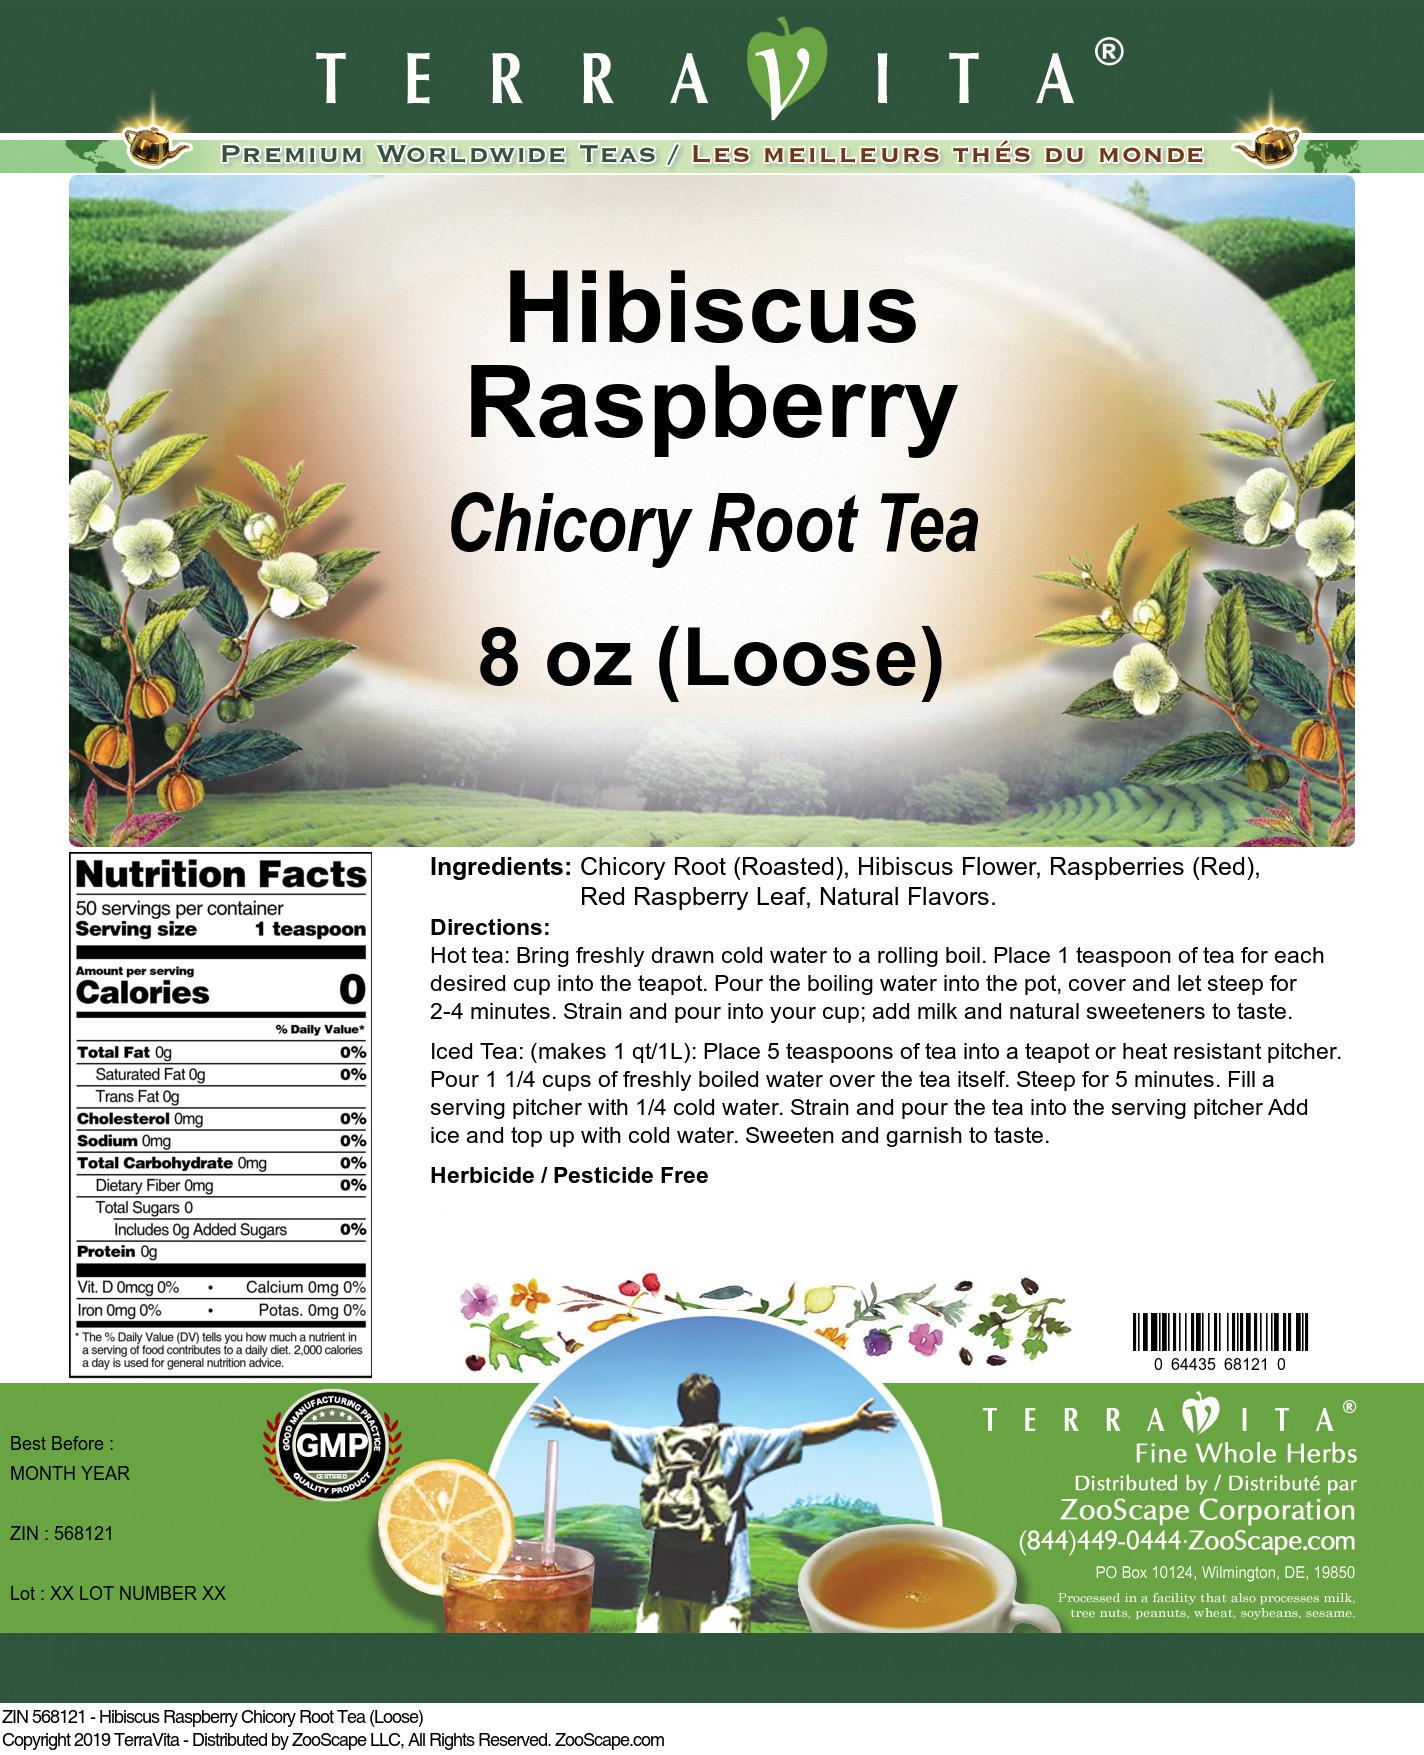 Hibiscus Raspberry Chicory Root Tea (Loose)